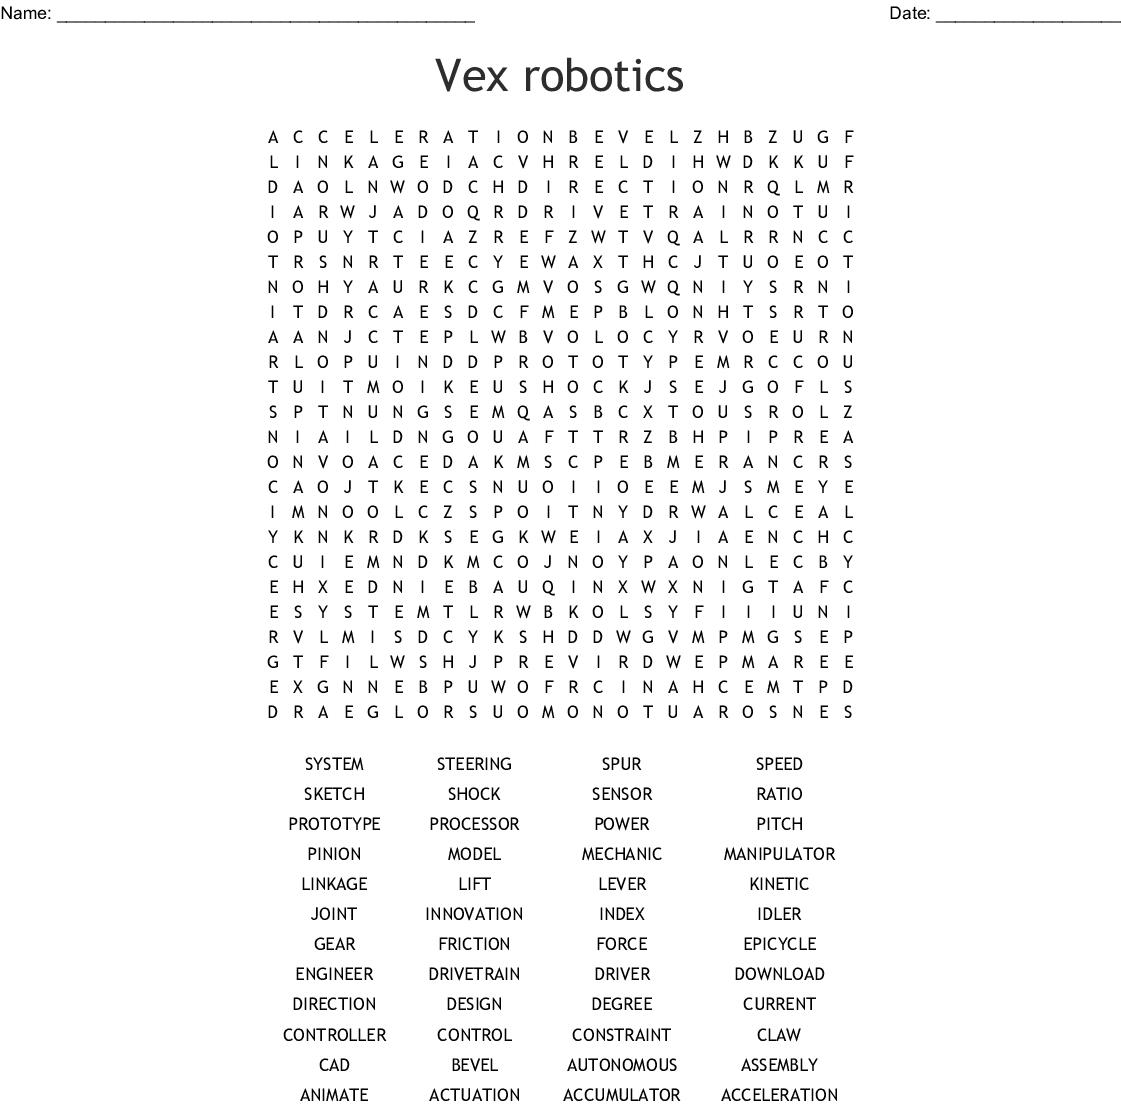 Vex Robotics Word Search - Wordmint - Free Printable Crossword Puzzles Robotics